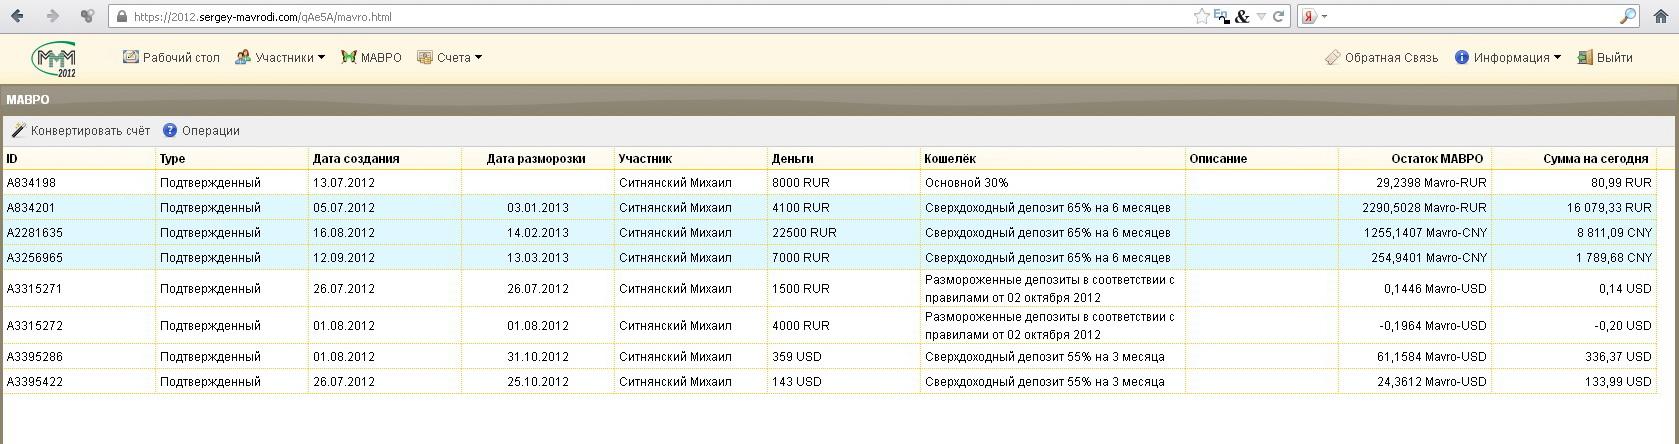 Мои вклады в МММ-2012 на 2 октября 2012